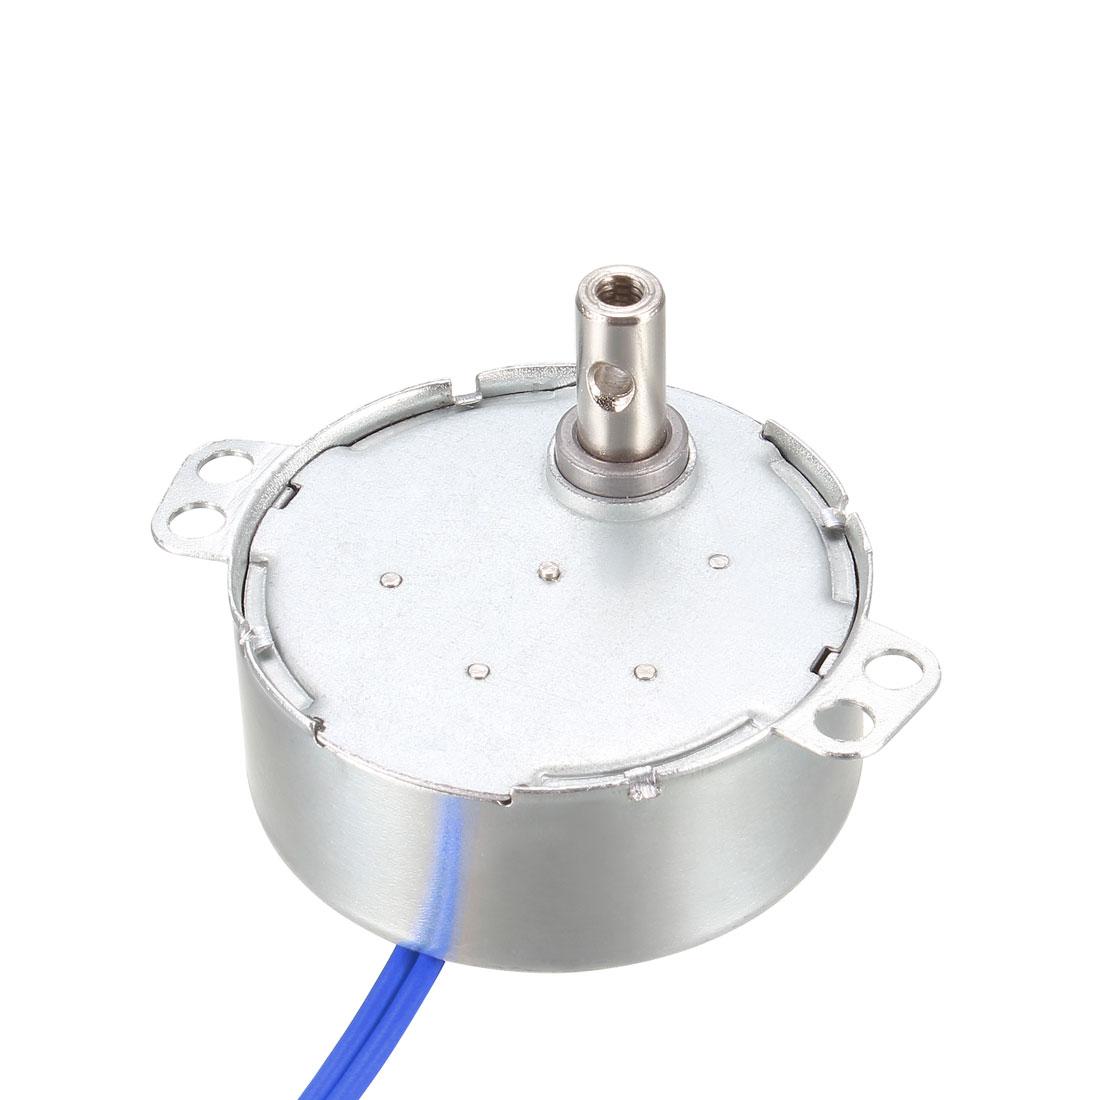 Electric Synchronous Synchron Motor Motor 100-127 VAC 50-60Hz CCW 4W 0.8-1RPM